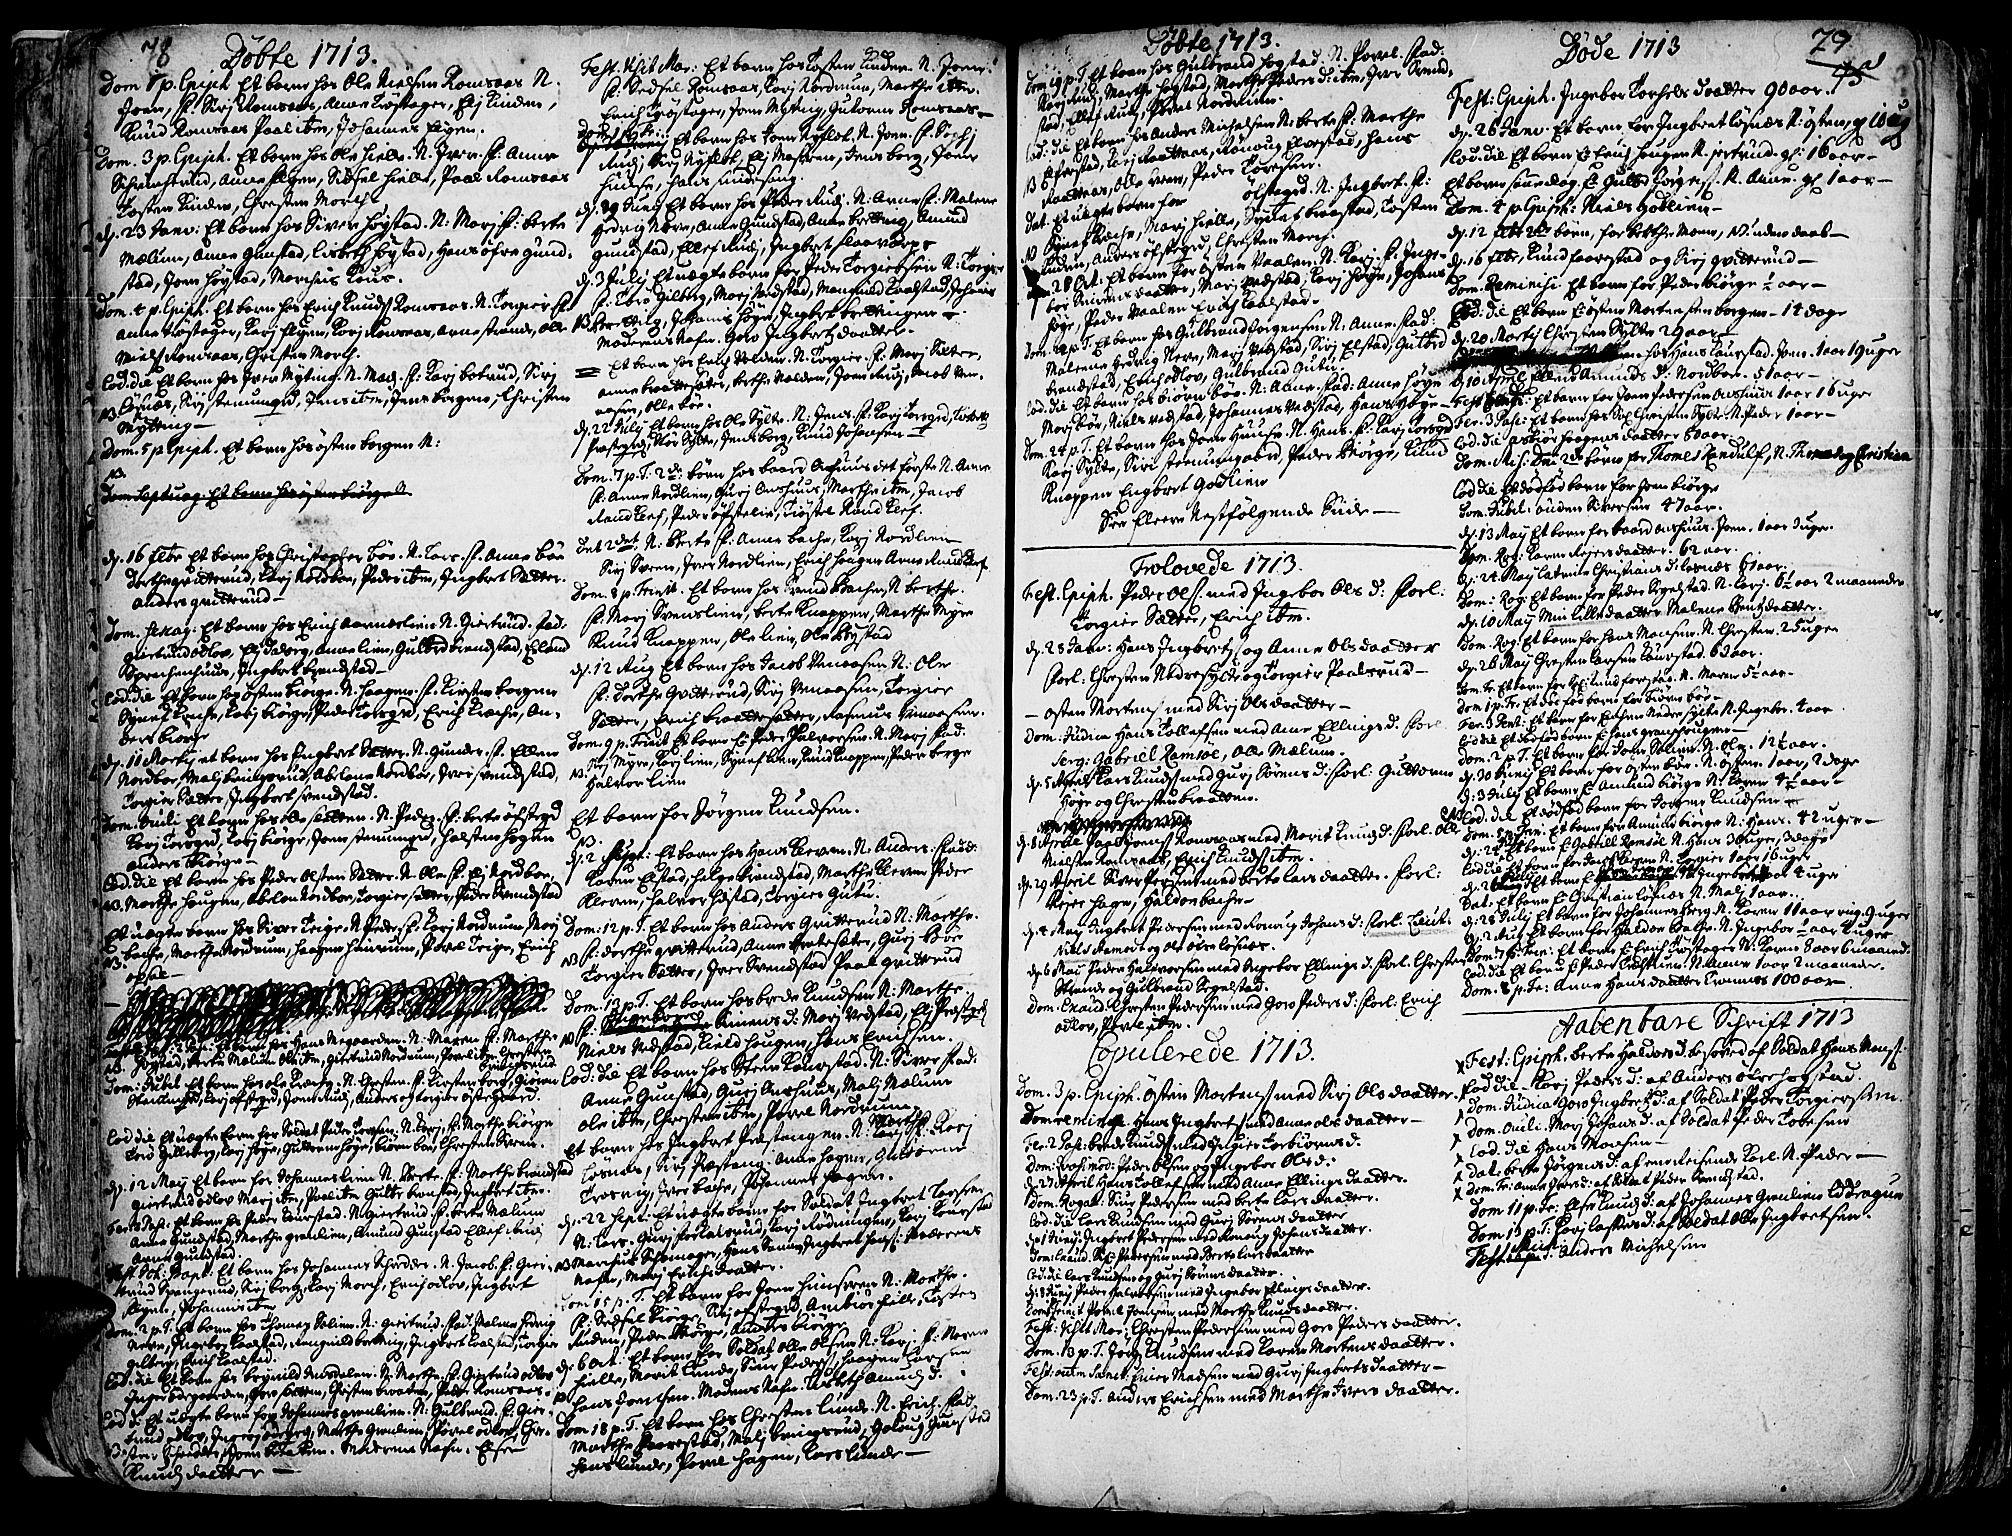 SAH, Ringebu prestekontor, Ministerialbok nr. 1, 1696-1733, s. 78-79